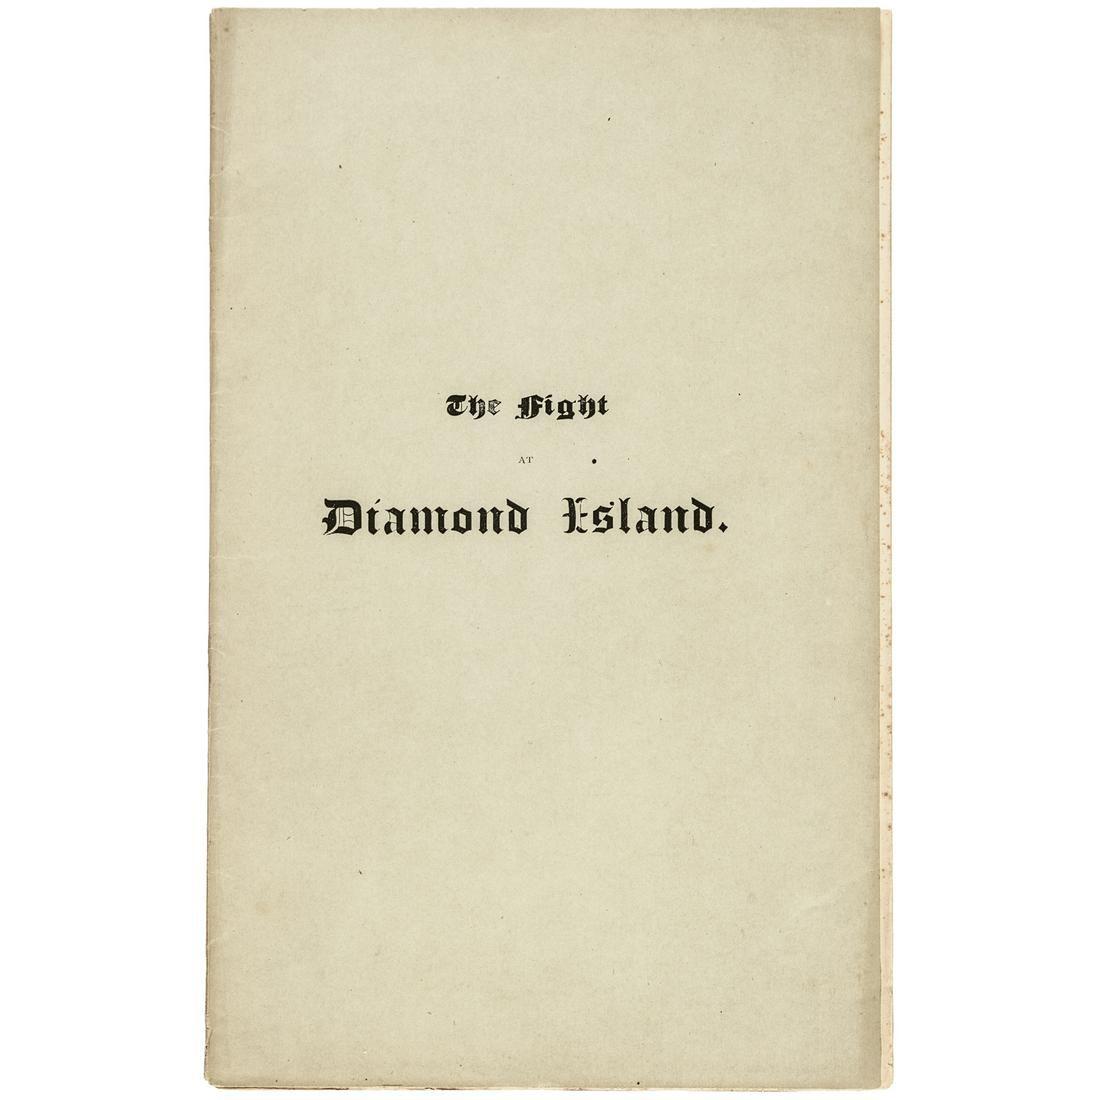 1872 THE FIGHT AT DIAMOND ISLAND Rev. War Battle